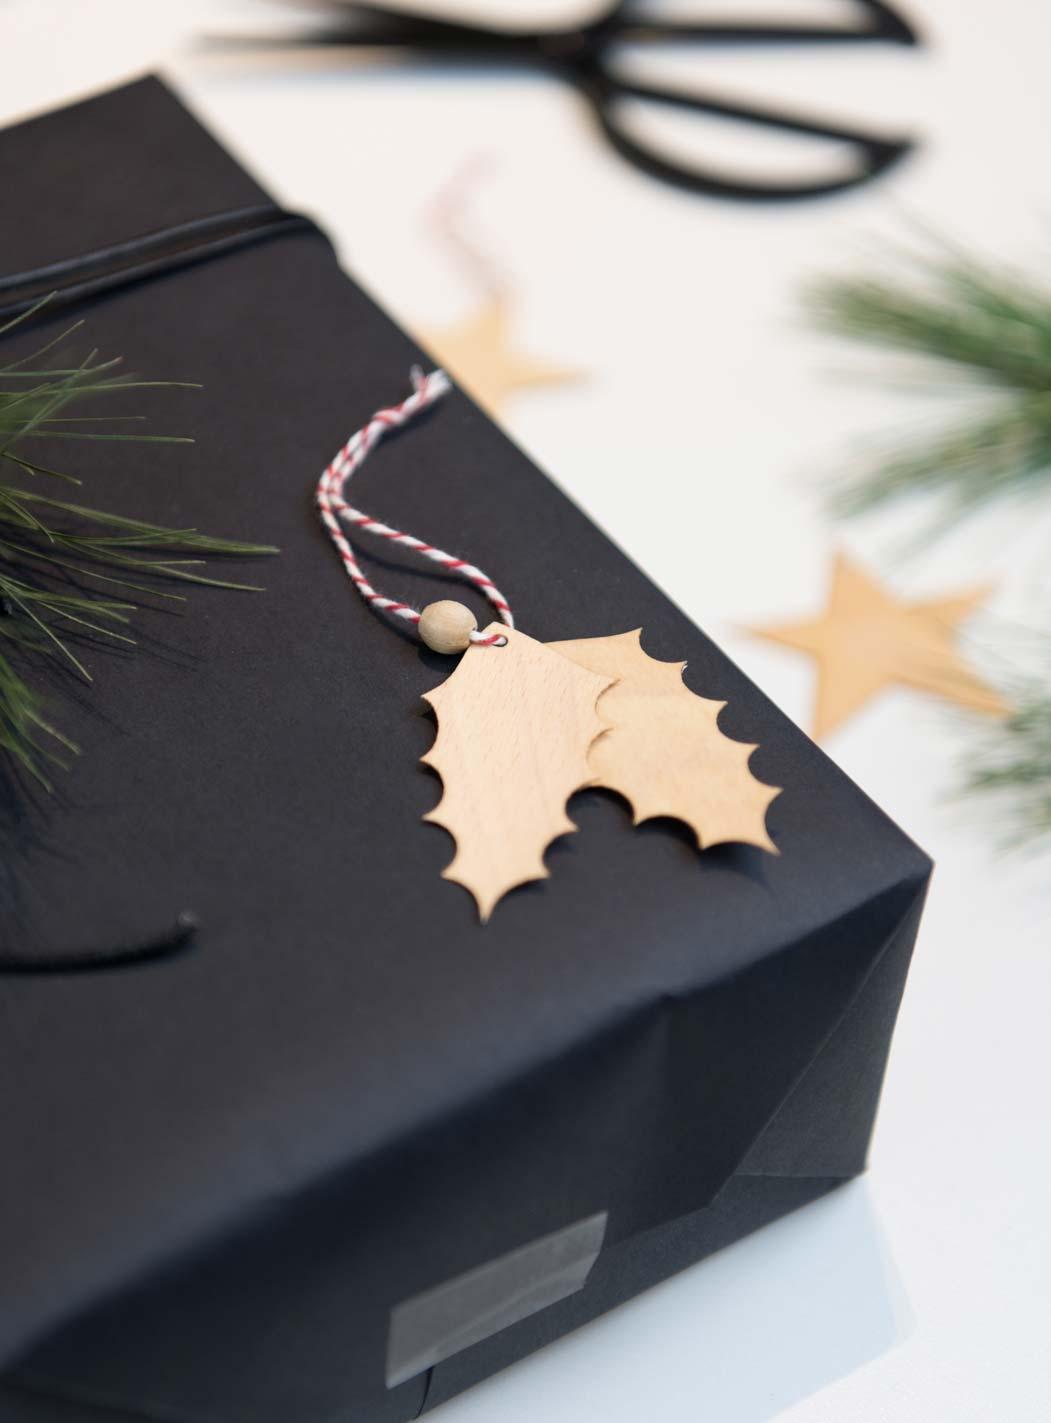 Geschenke verpacken - Anhänger aus Holz - Stechpalme